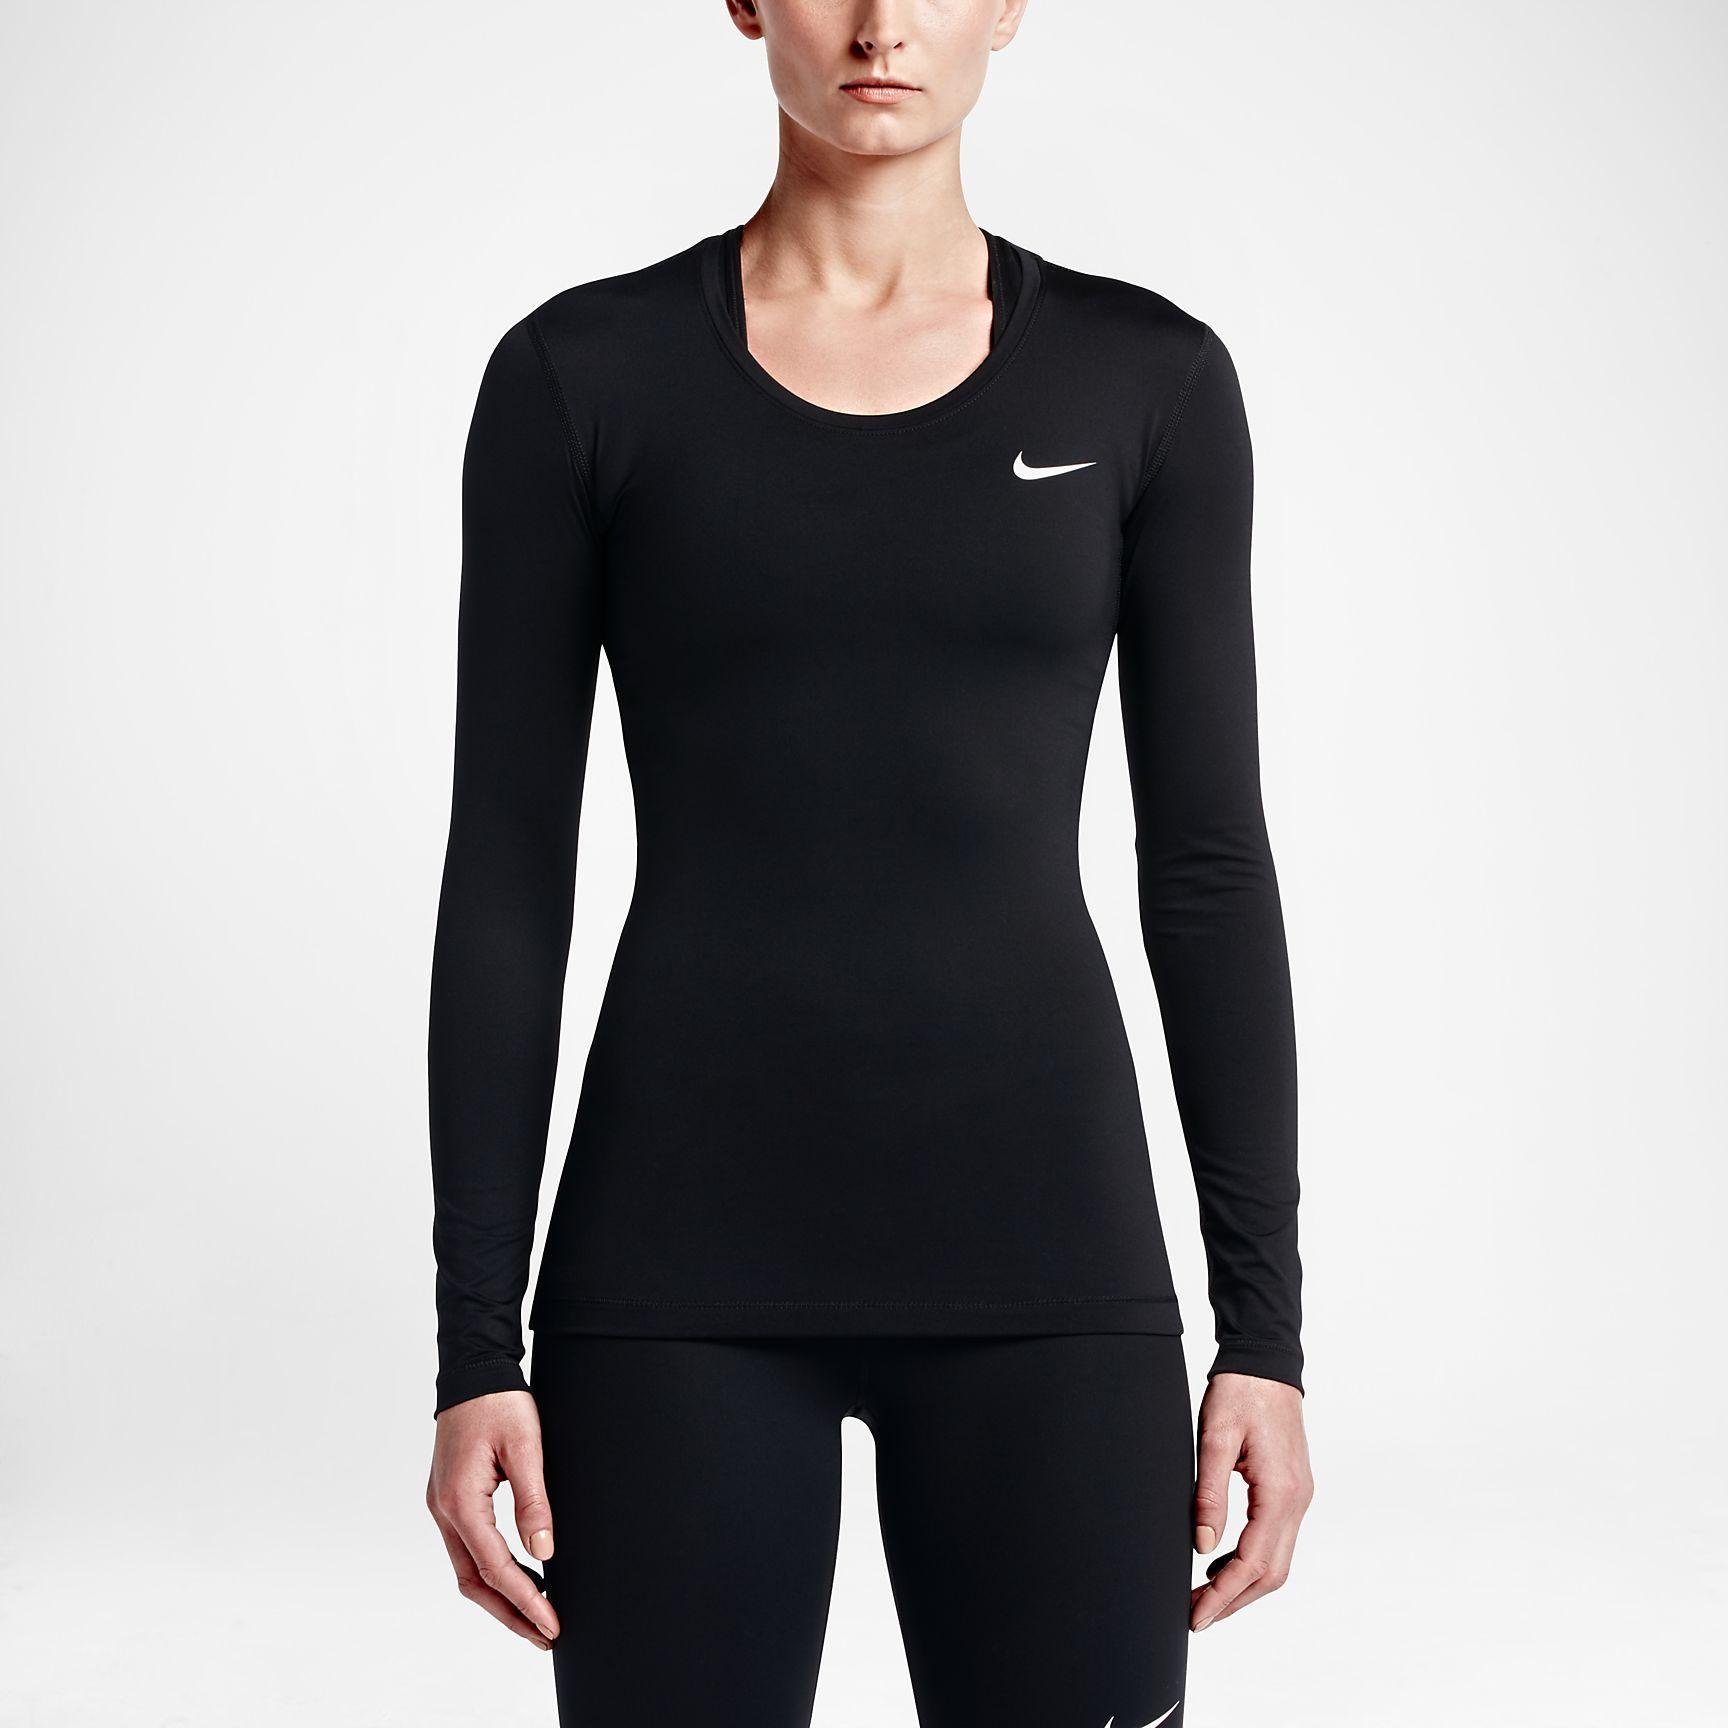 Nike Pro Women's Long Sleeve Training Tops White/Black